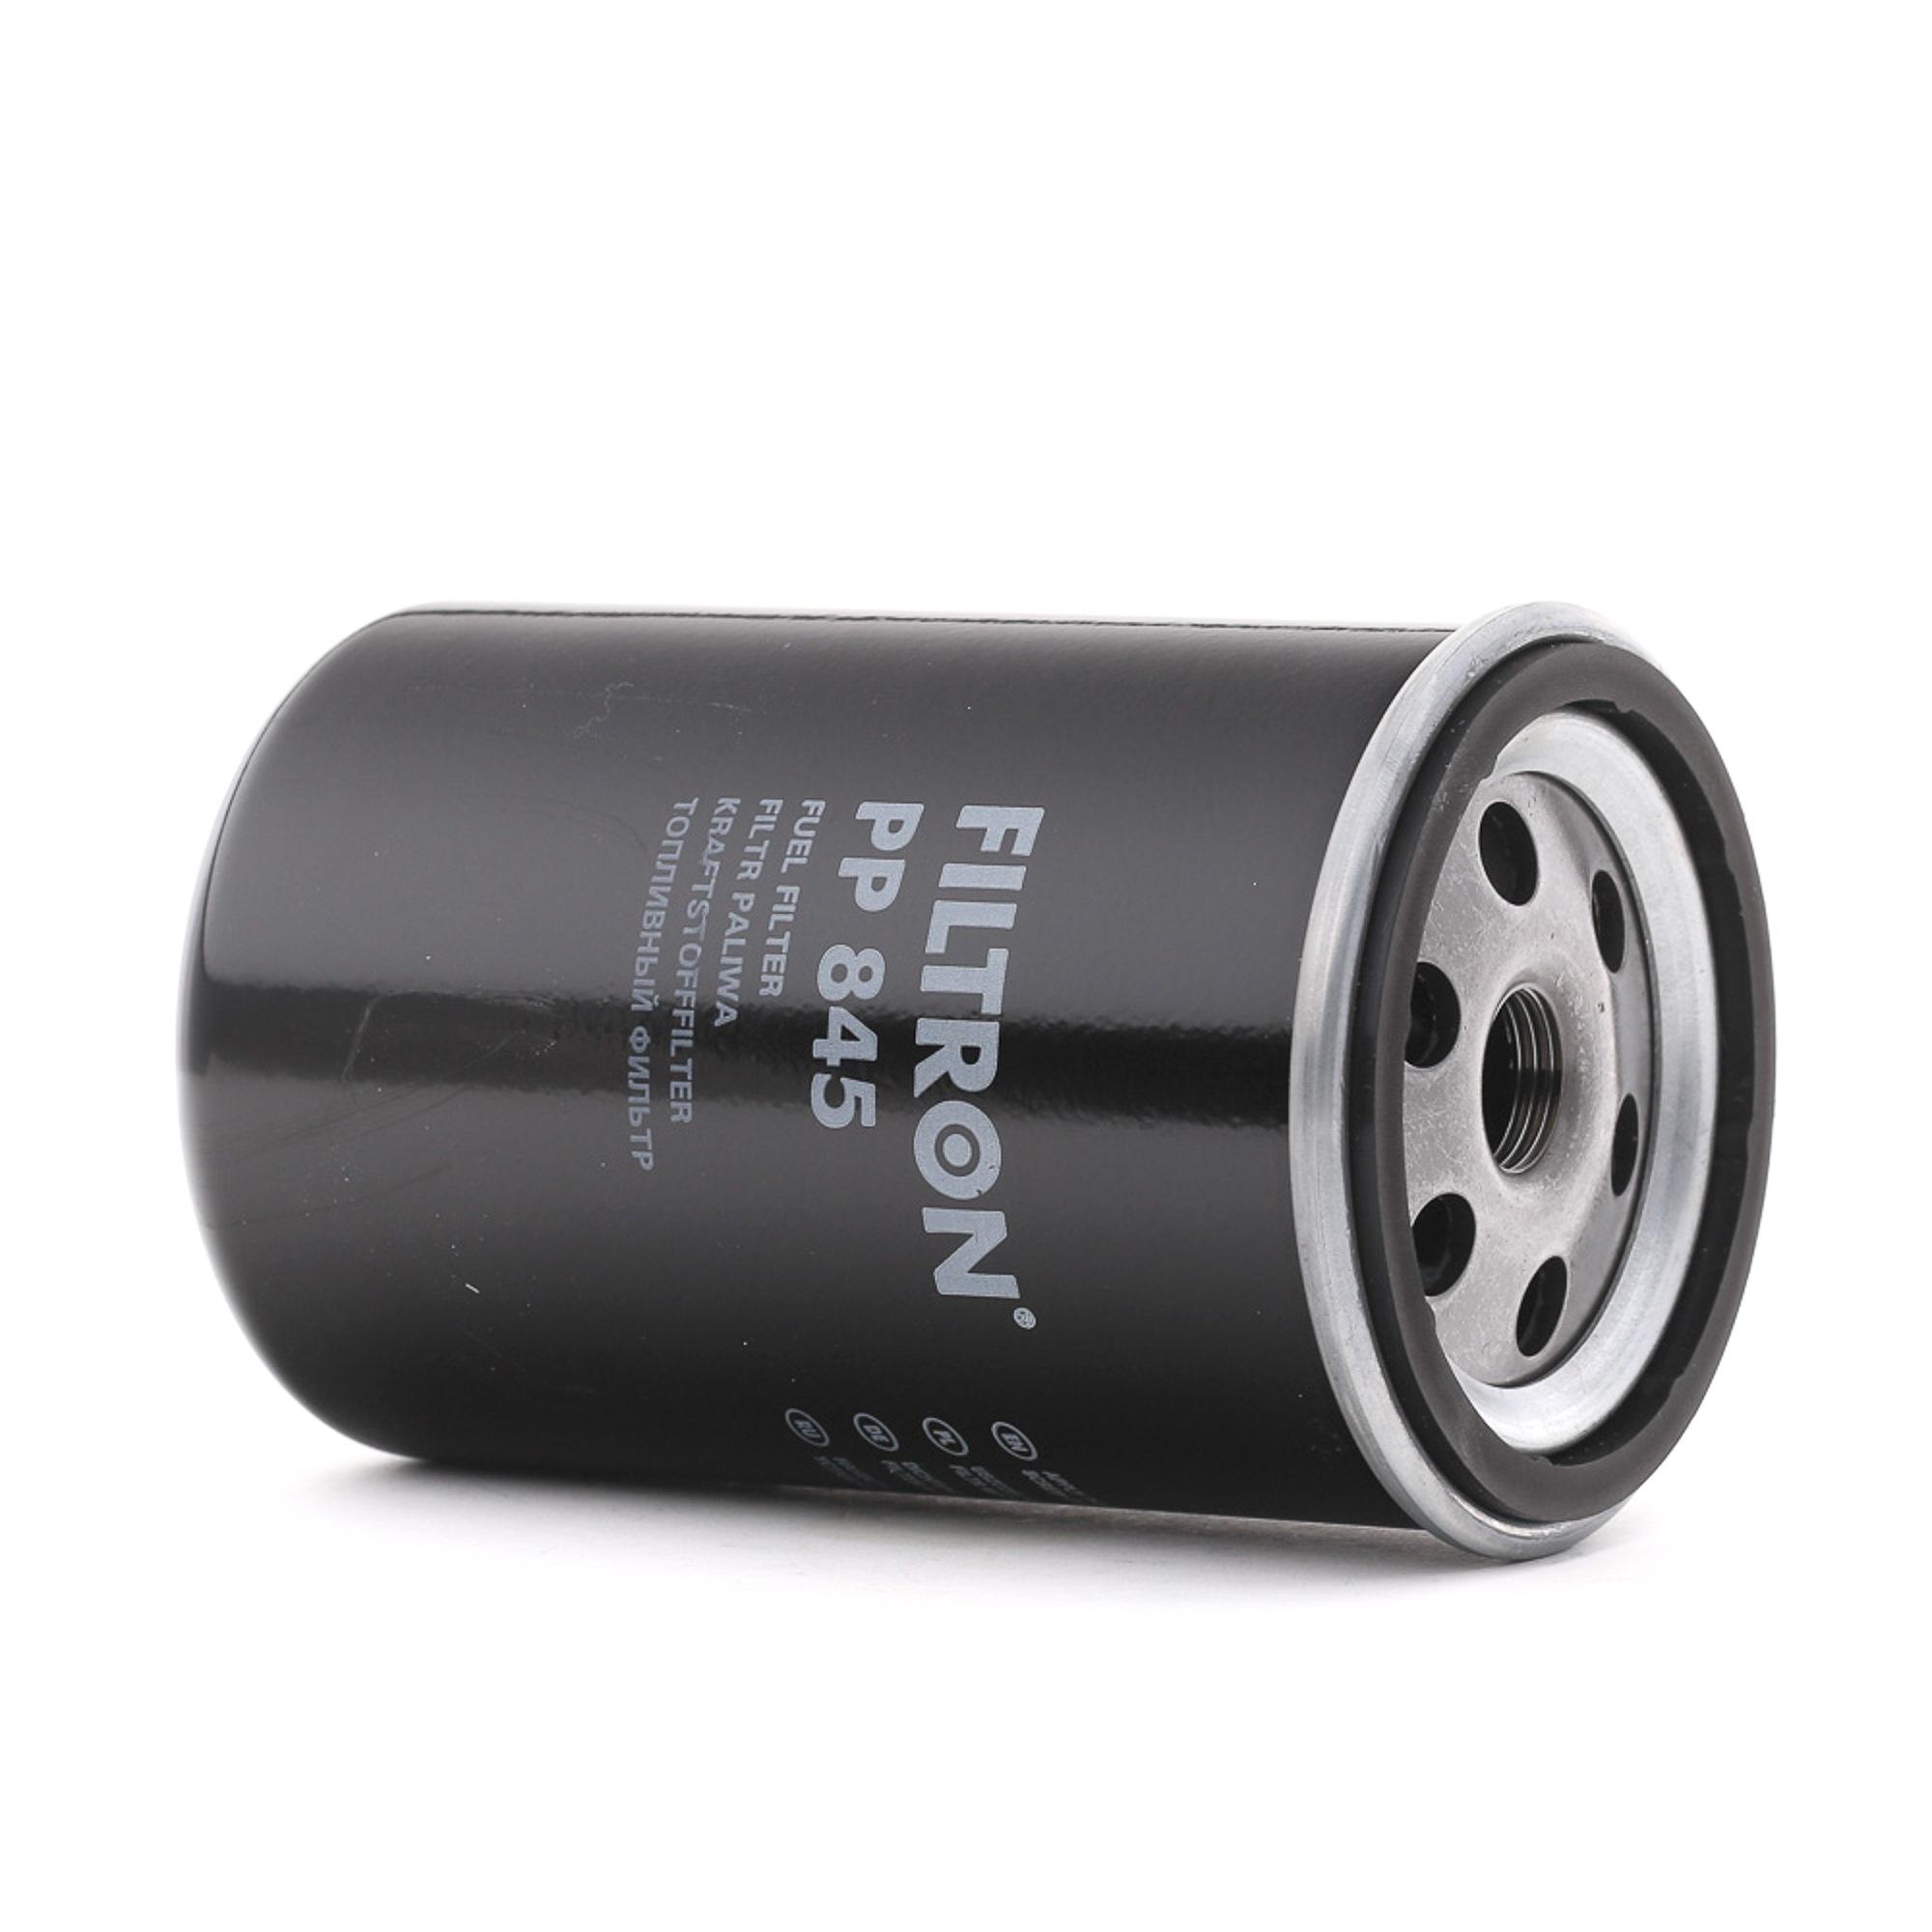 PP 845 FILTRON Filtr paliwa do SCANIA 2 - series - kup teraz